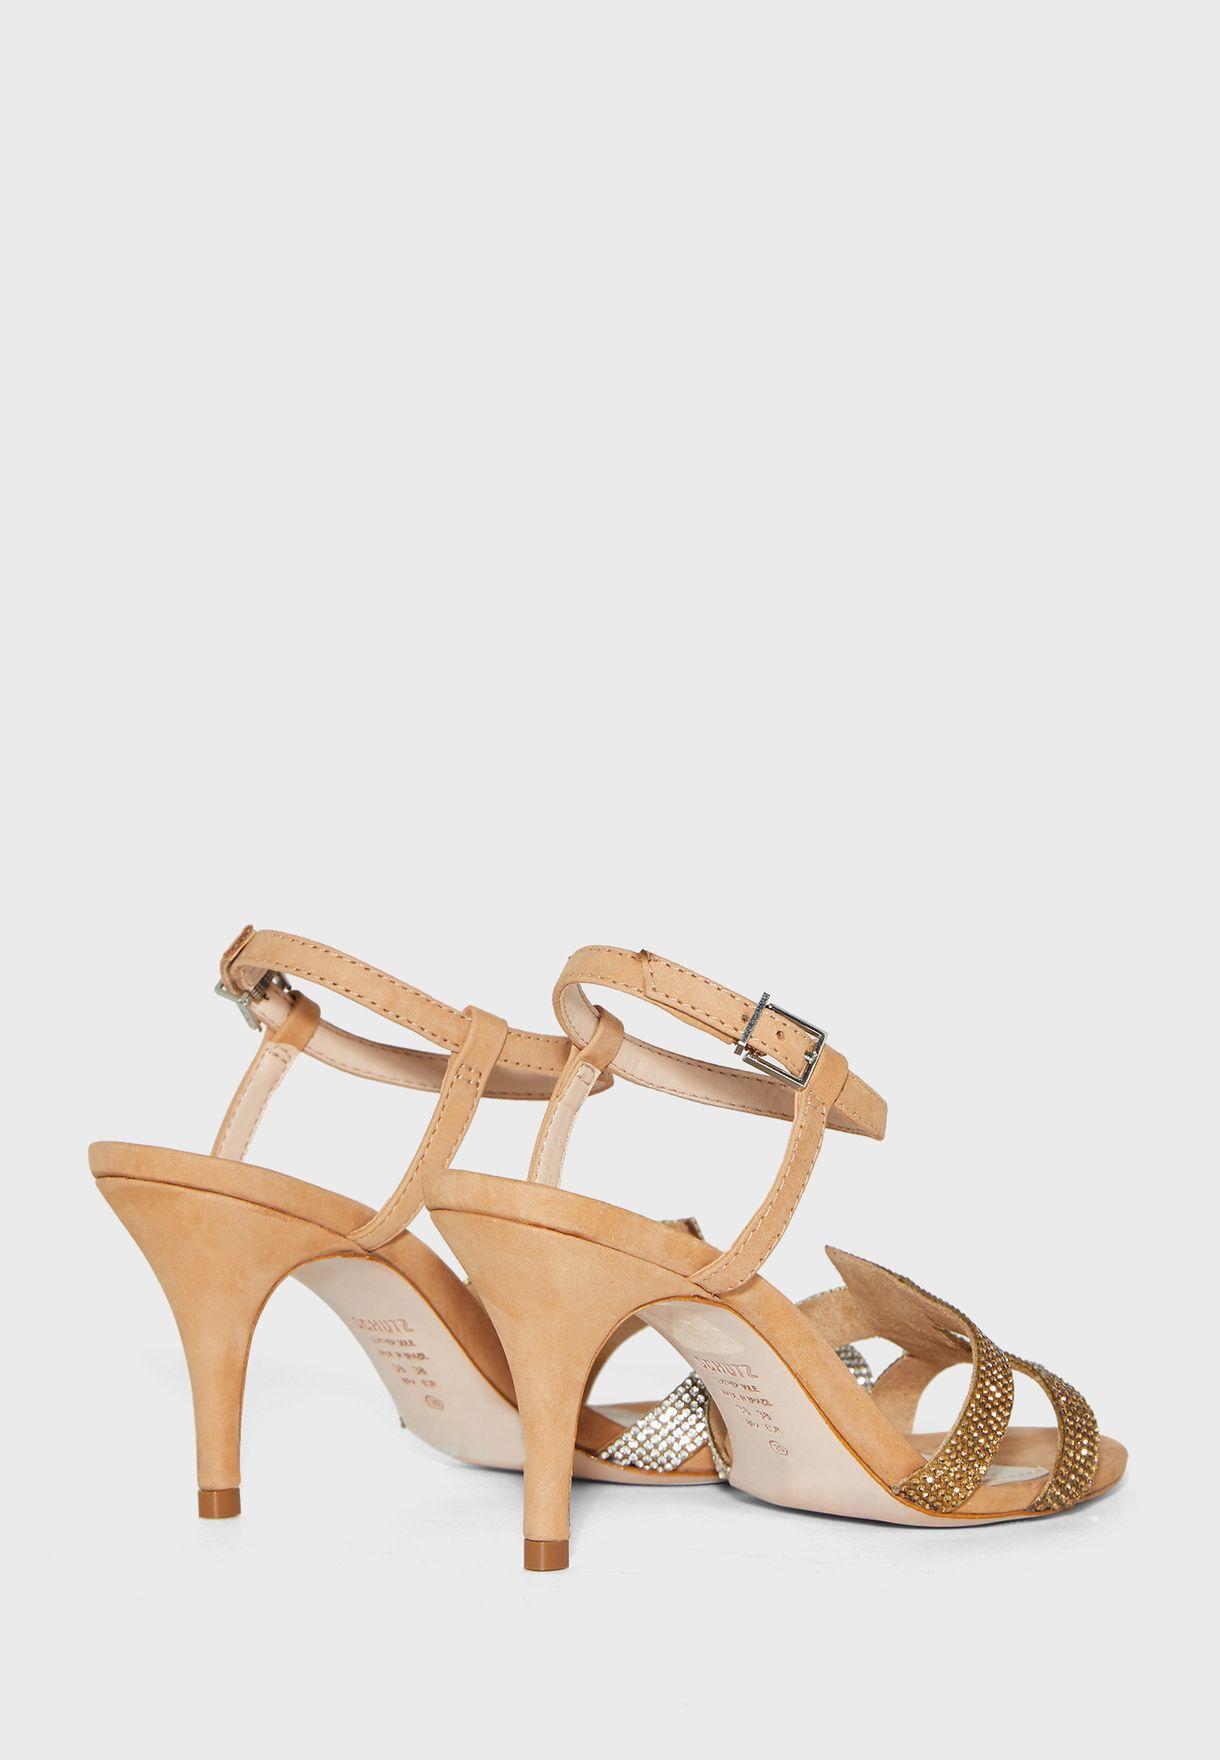 Schutz Ankle Strap Buckle Detail Sandal - Honey Beige Brand Shoes